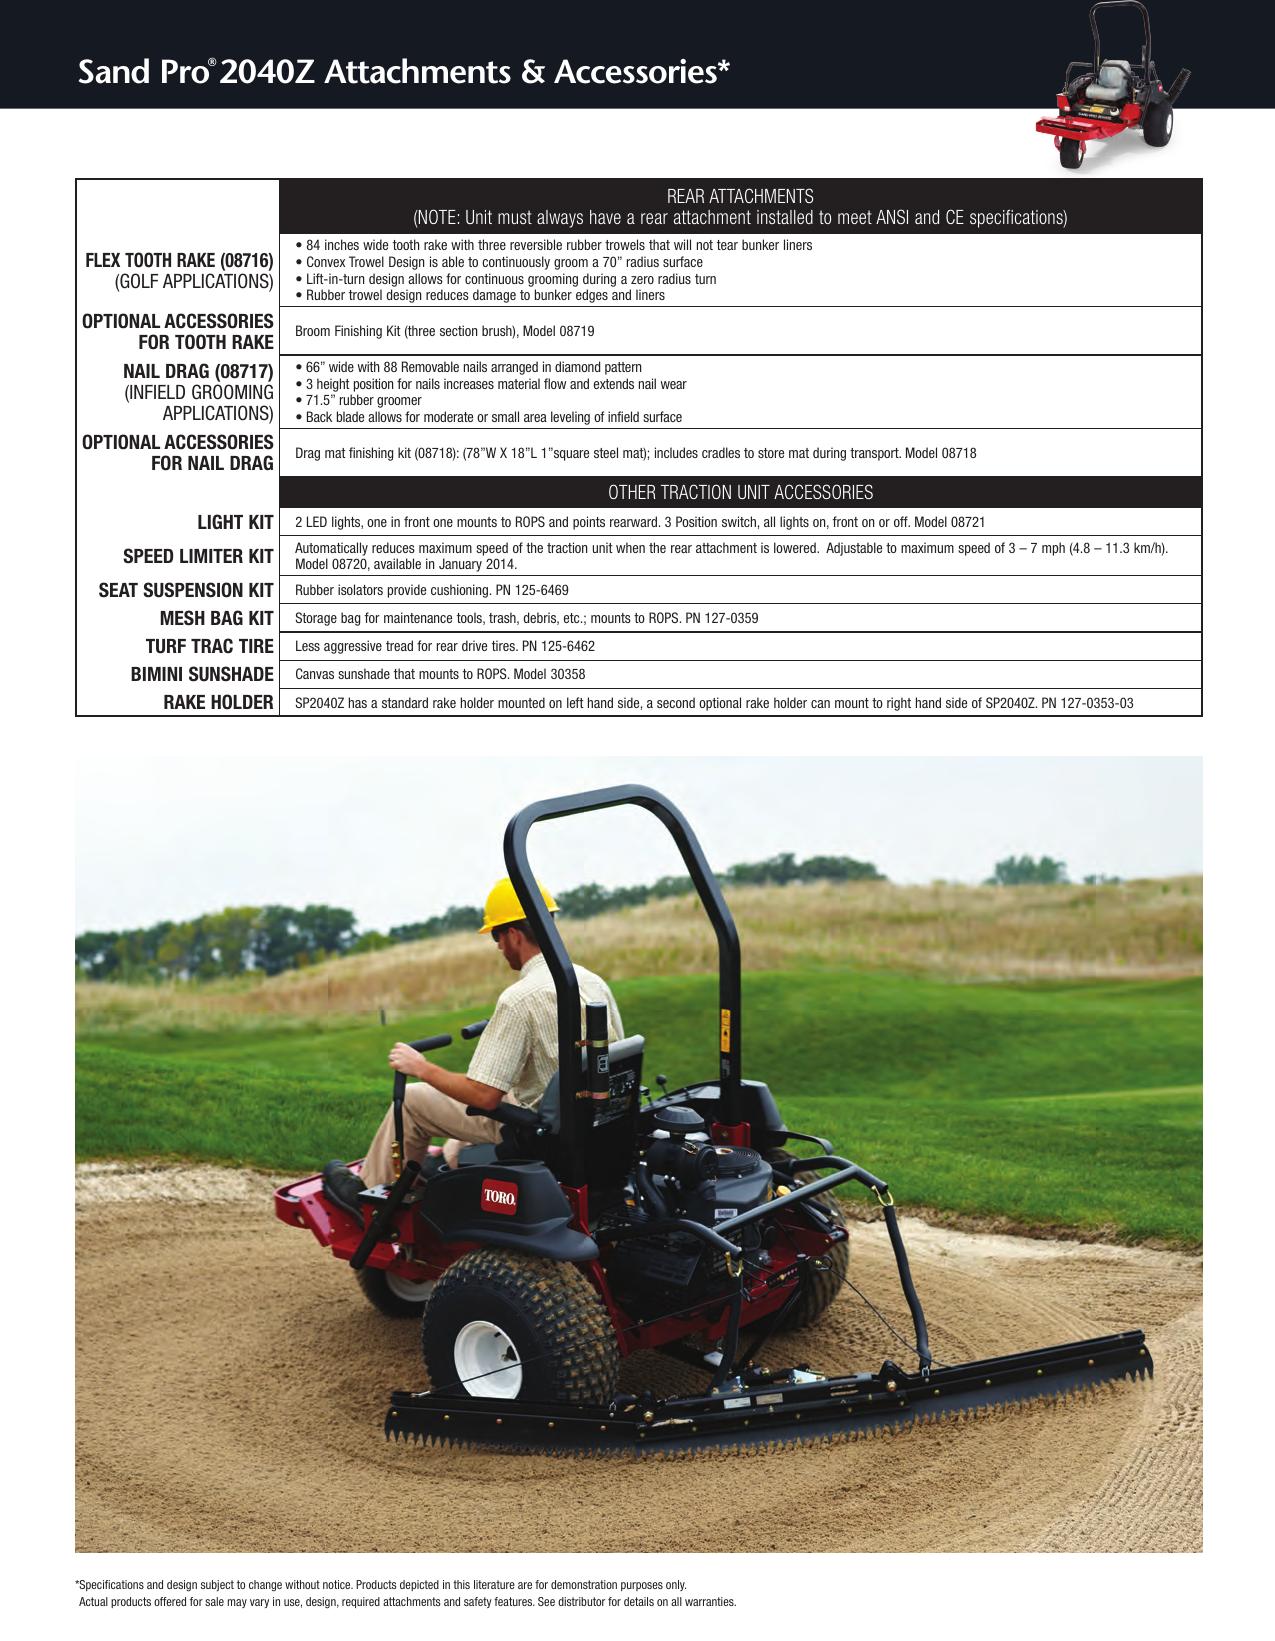 Toro Sand Pro 2040Z 08706 Sell Sheet